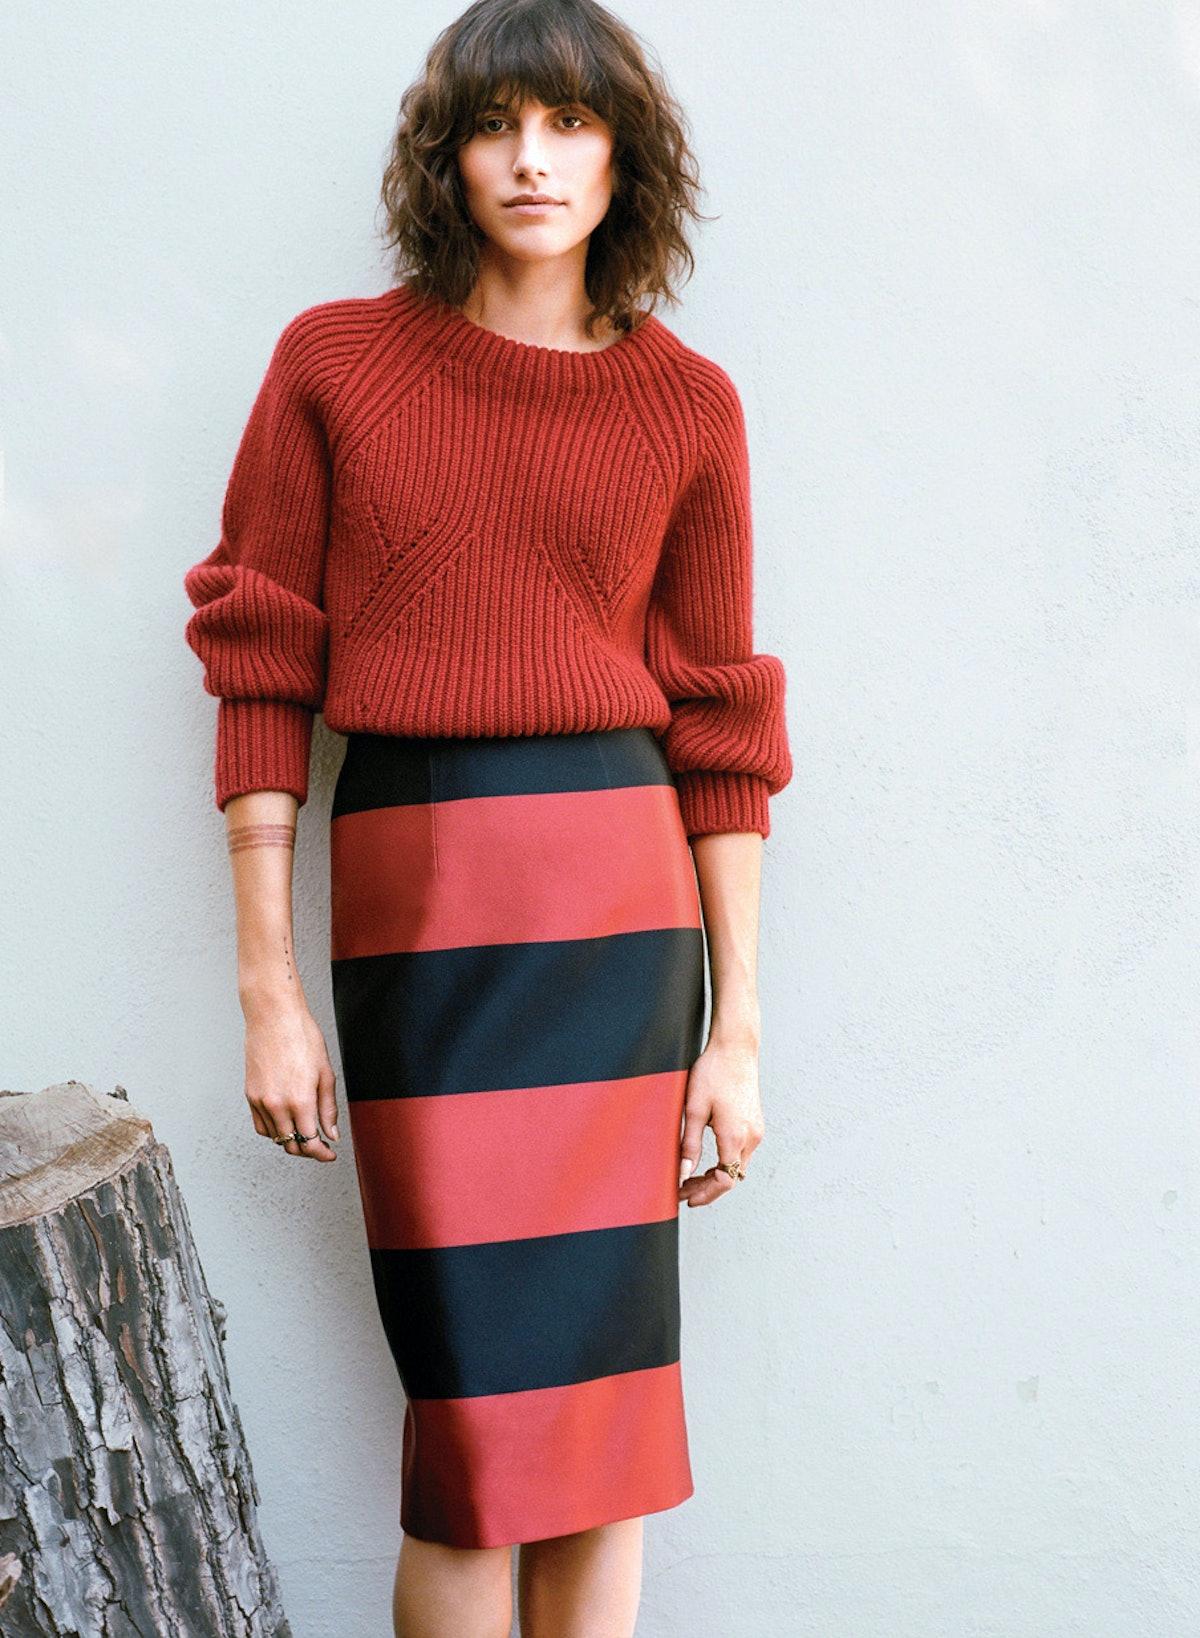 langley-fox-it-girl-stripes-trend-01.jpg